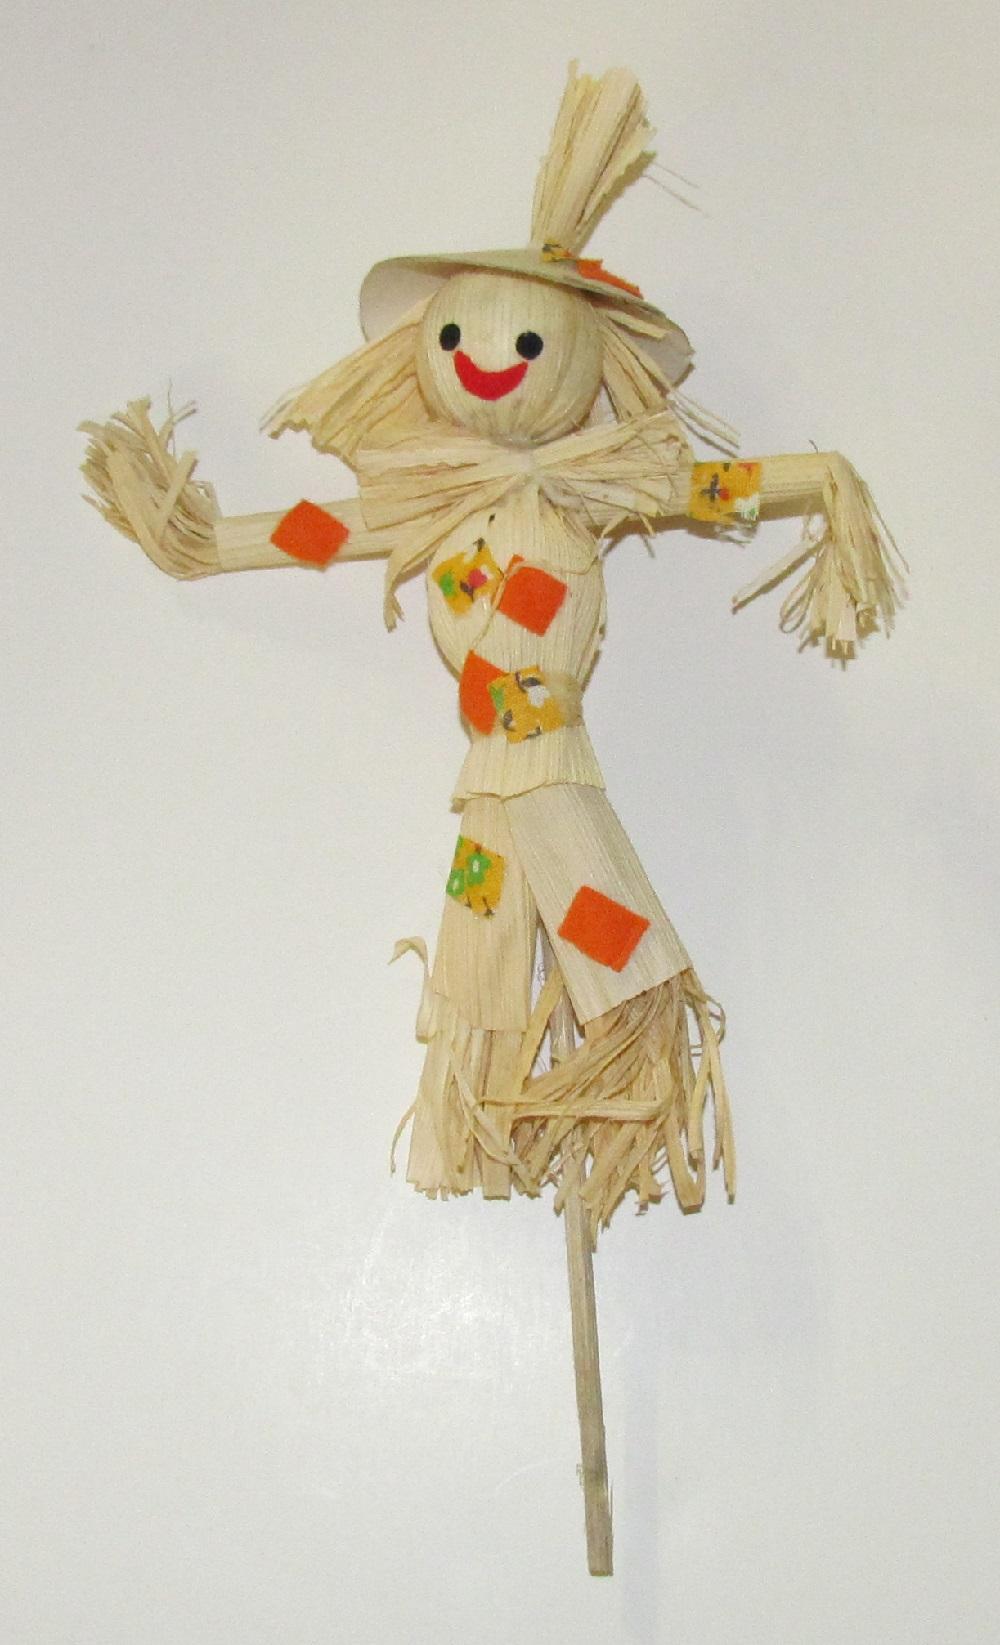 Corn Husk & Straw Scarecrow - 8 inches - 1 piece